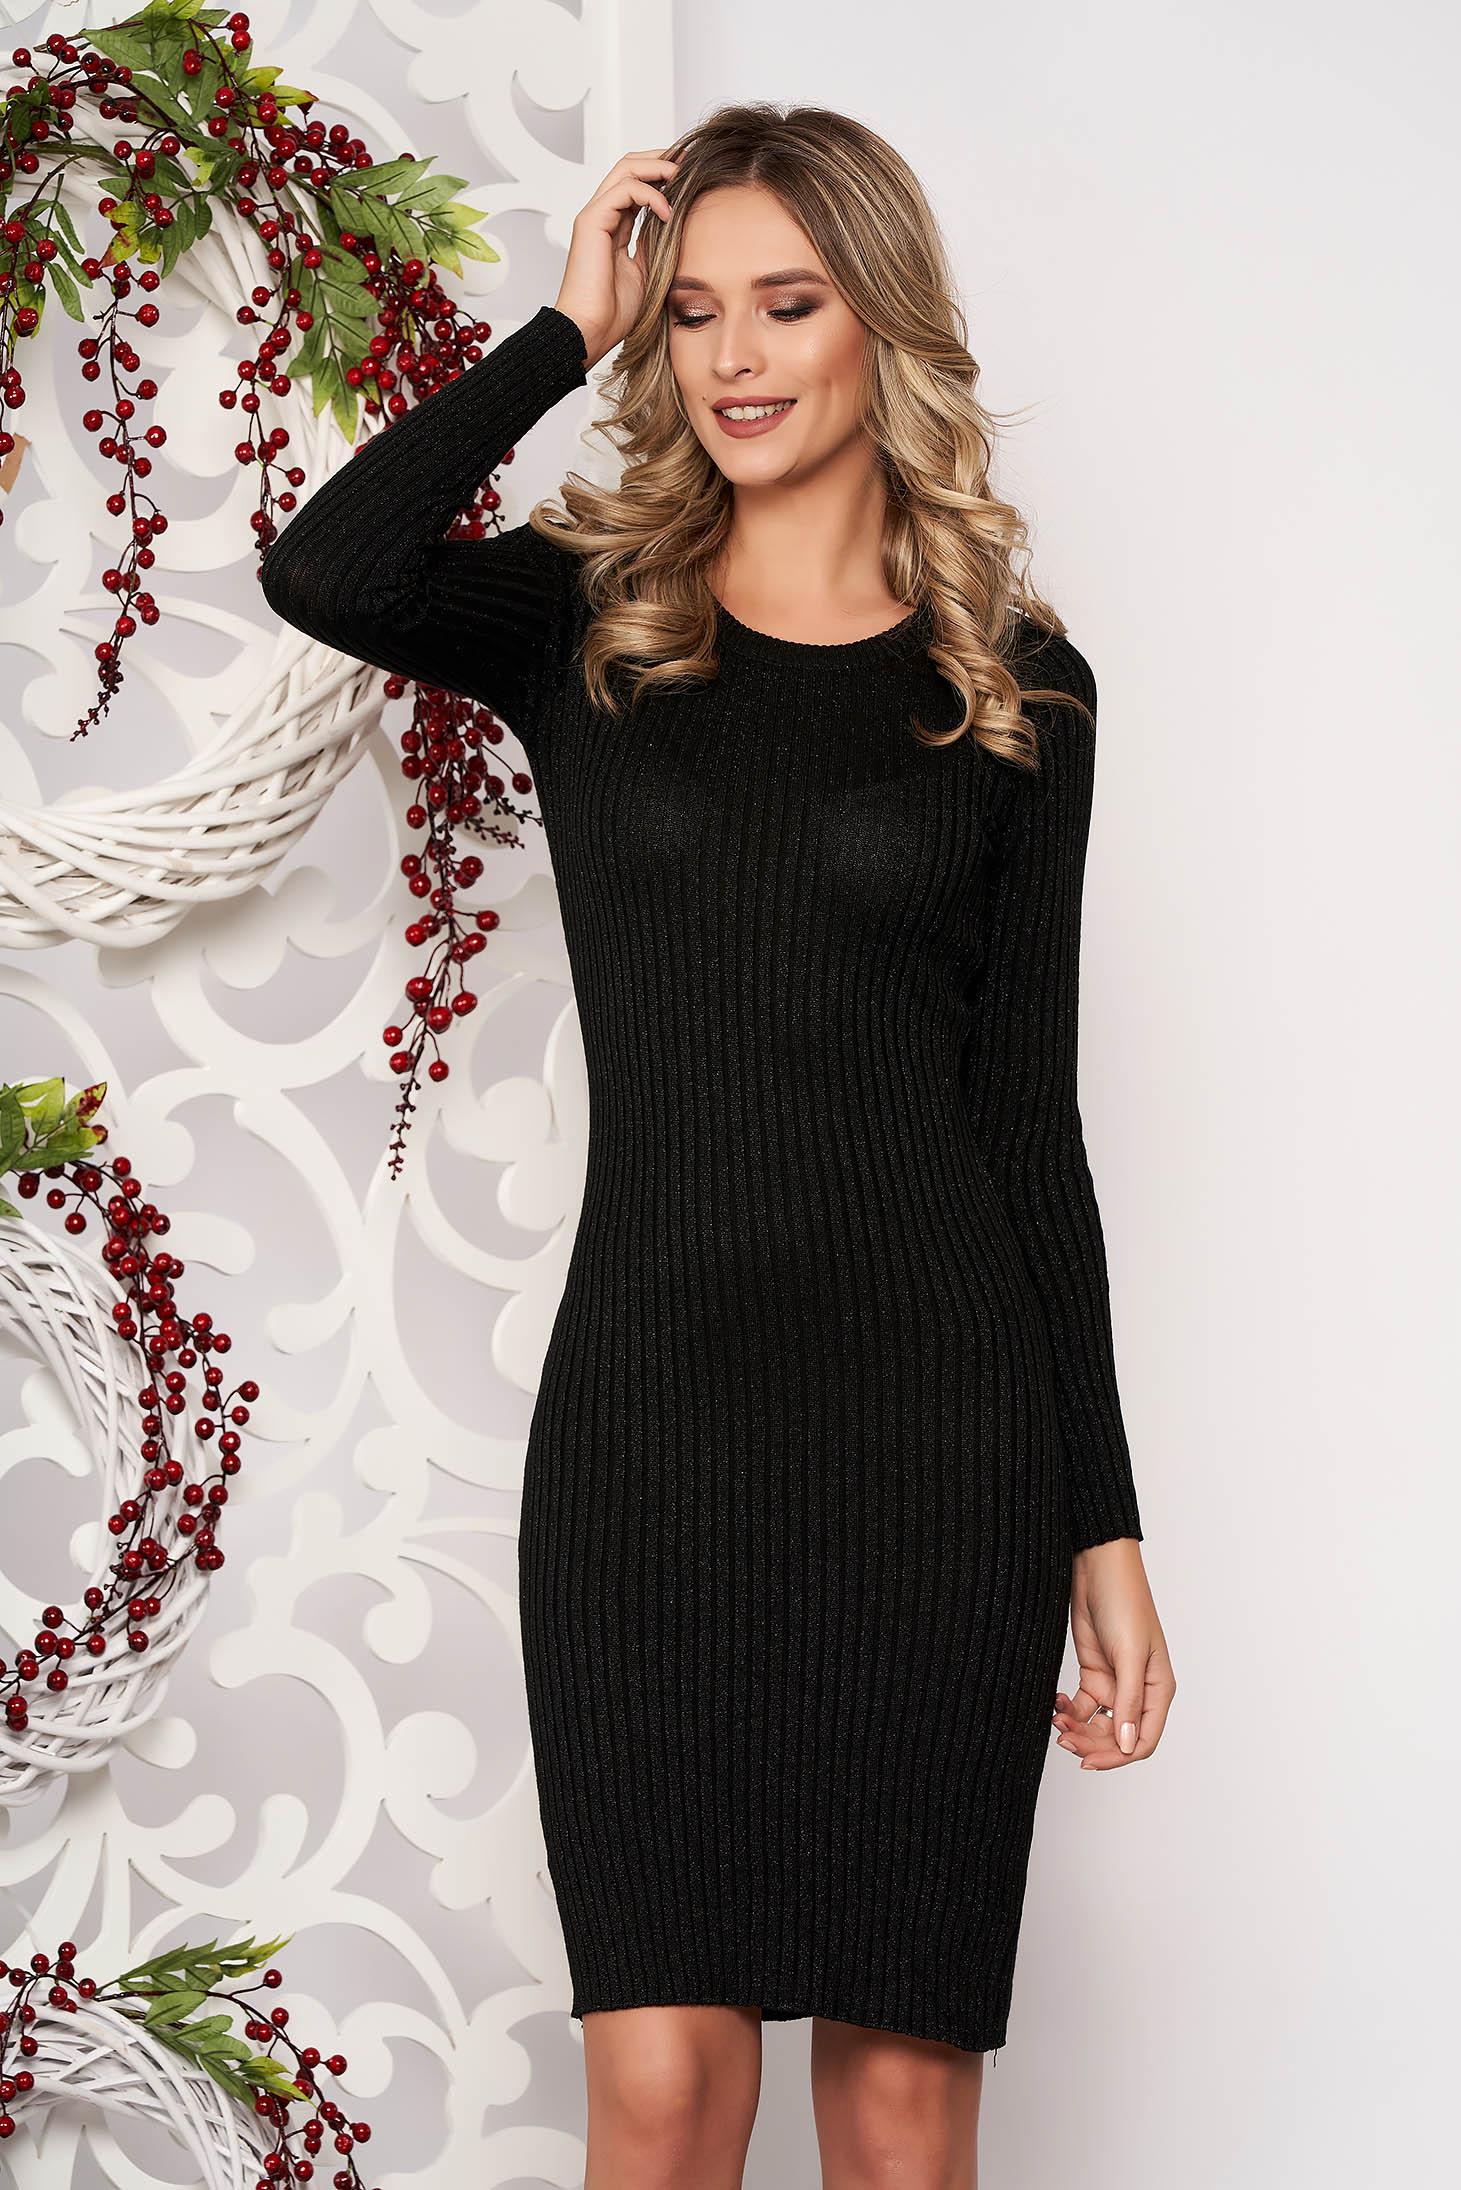 Dress black long sleeved slightly elastic cotton pencil midi